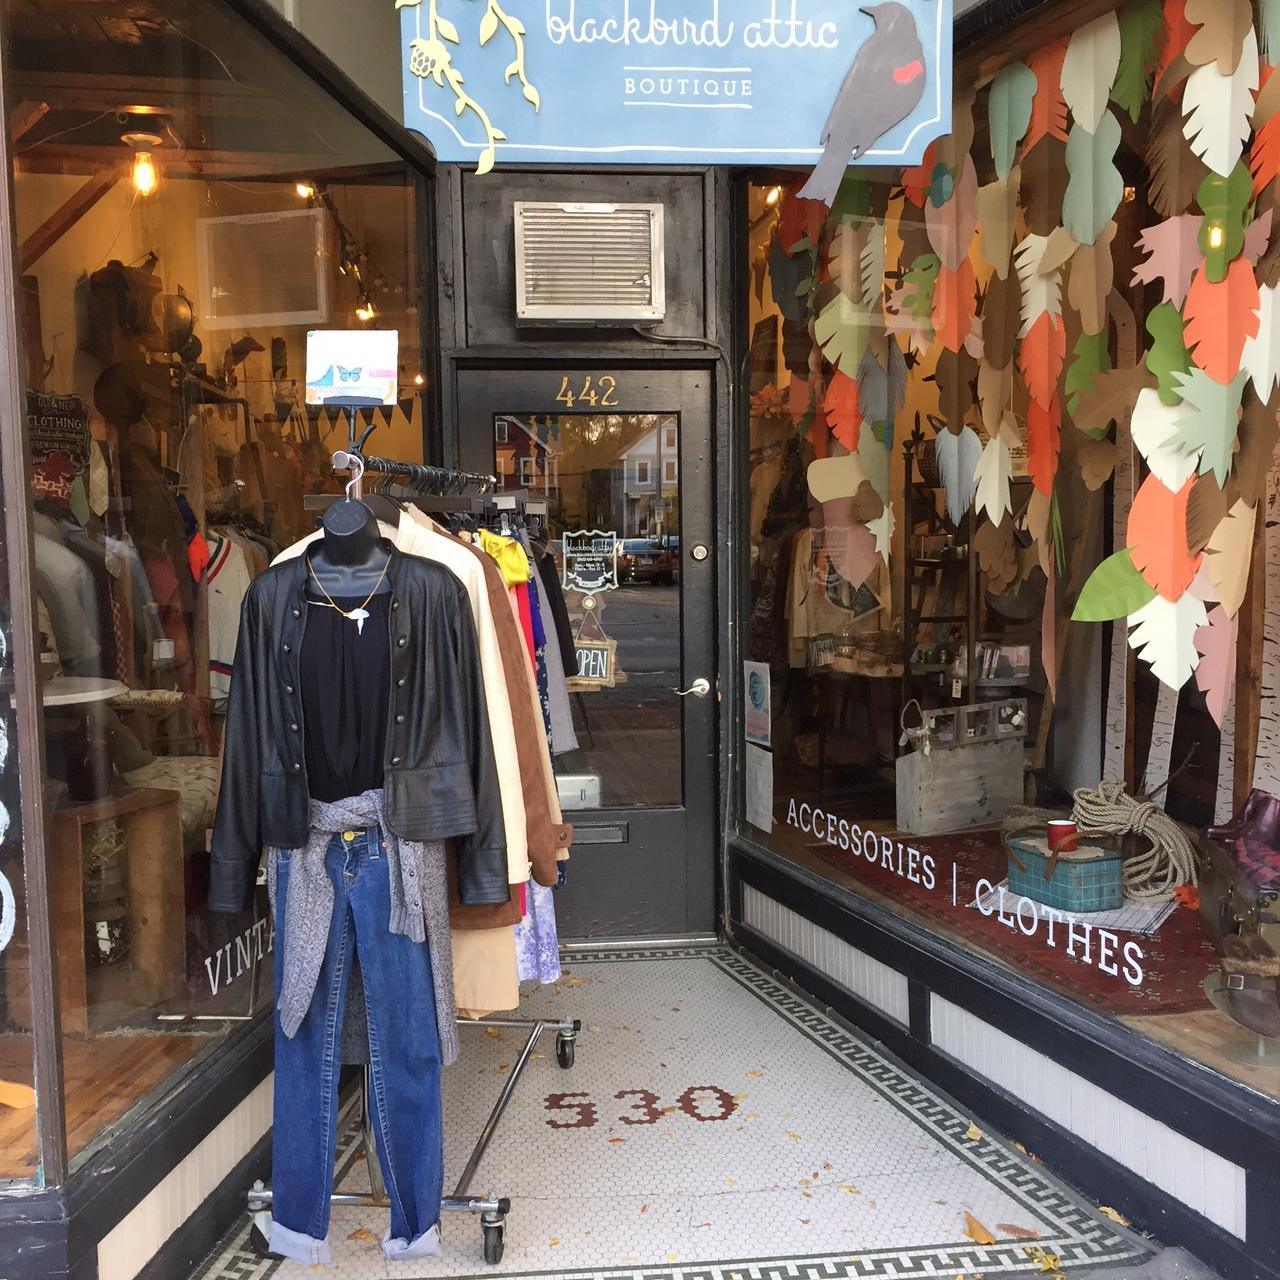 Sale rack at Blackbird Attic